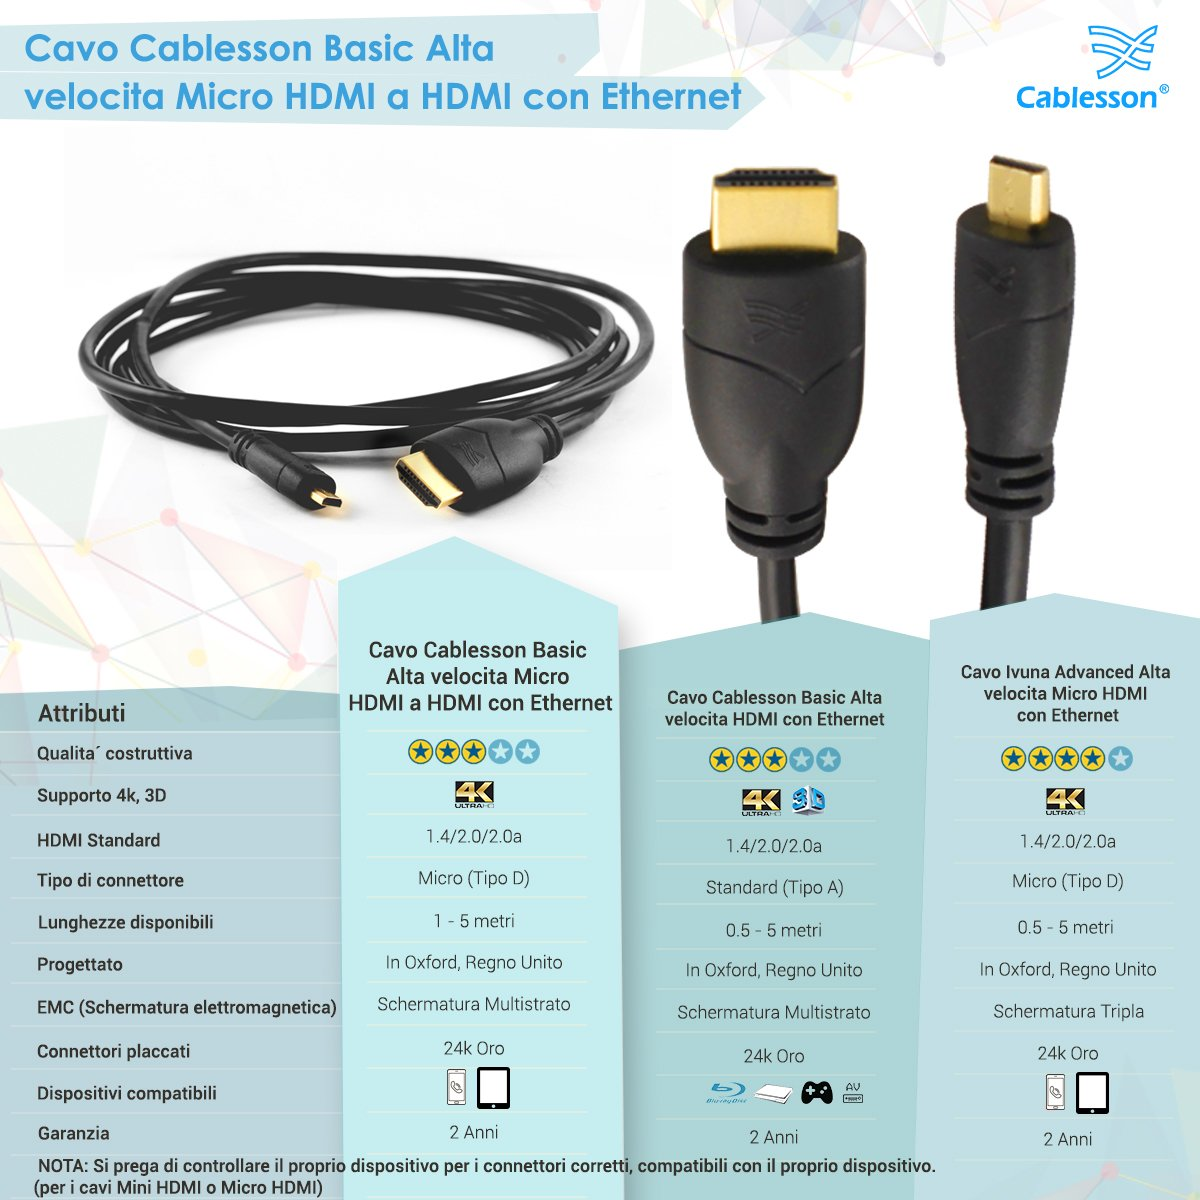 LCD PS4 Cablesson Basics 5m Cavo ad alta velocit/á con Ethernet - 4K. Oro cavo HDMI con Ethernet compatibilit/á FULL HD 2160p 1080p SKY HD ultima versione 2.0//1.4a, 21Gbps PLASMA /& LED TVs